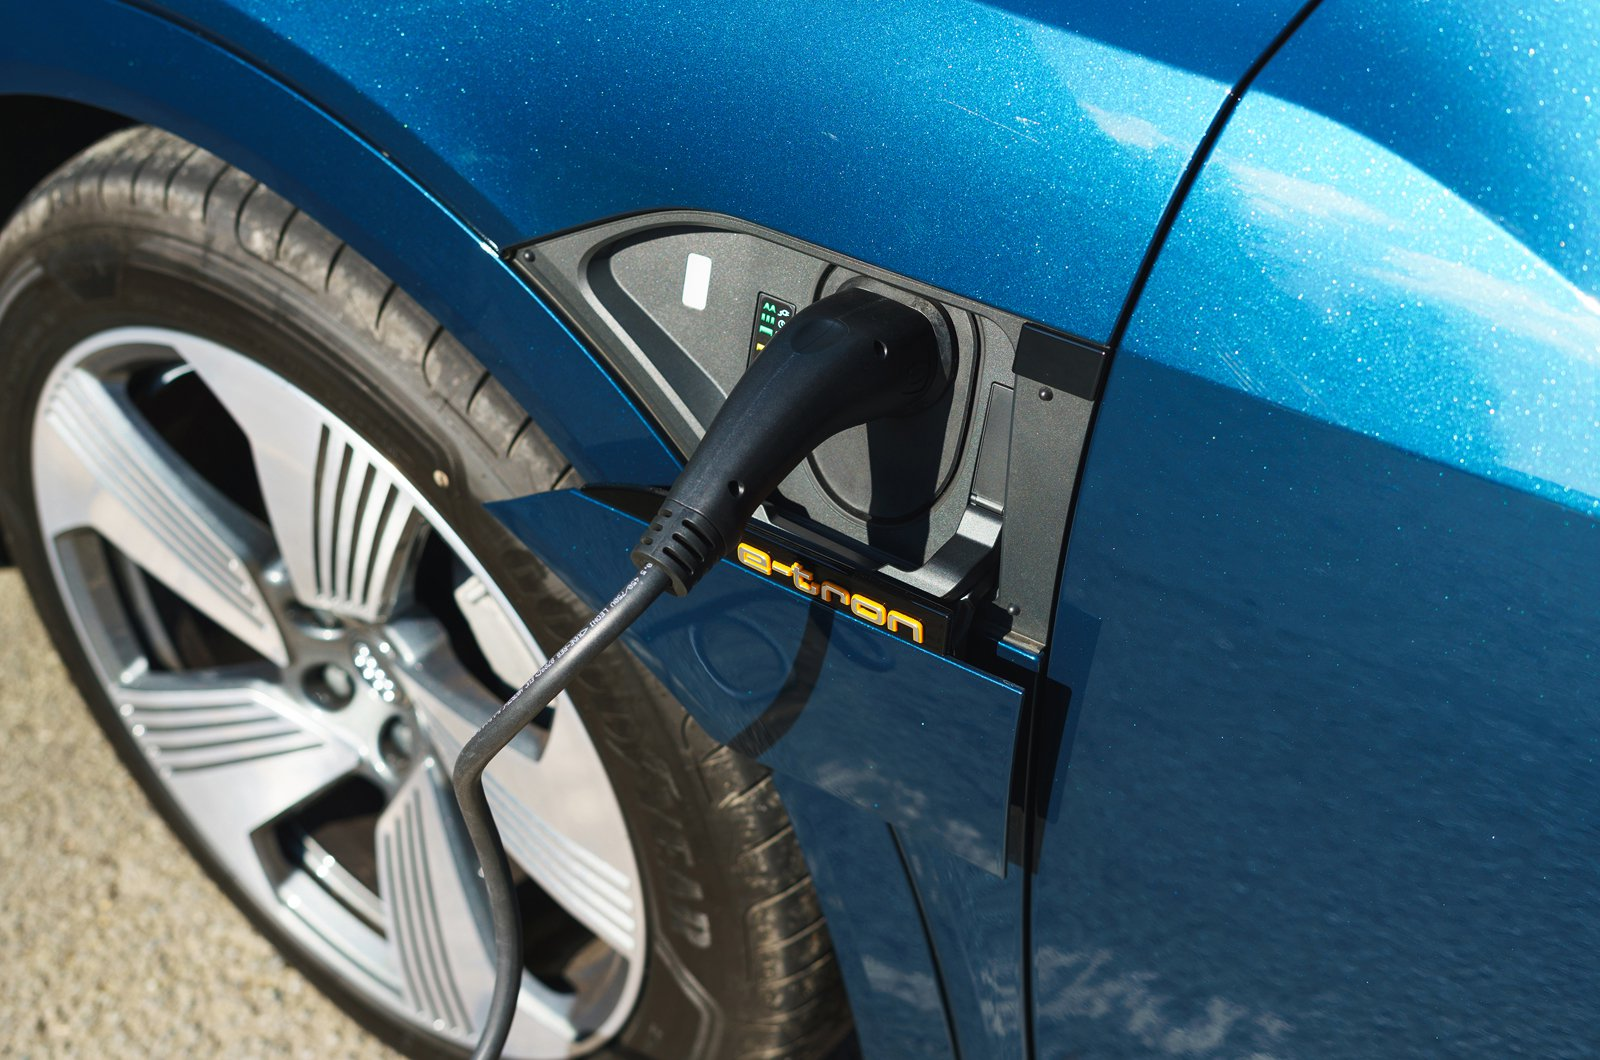 Audi E-tron 2019 UK charging socket